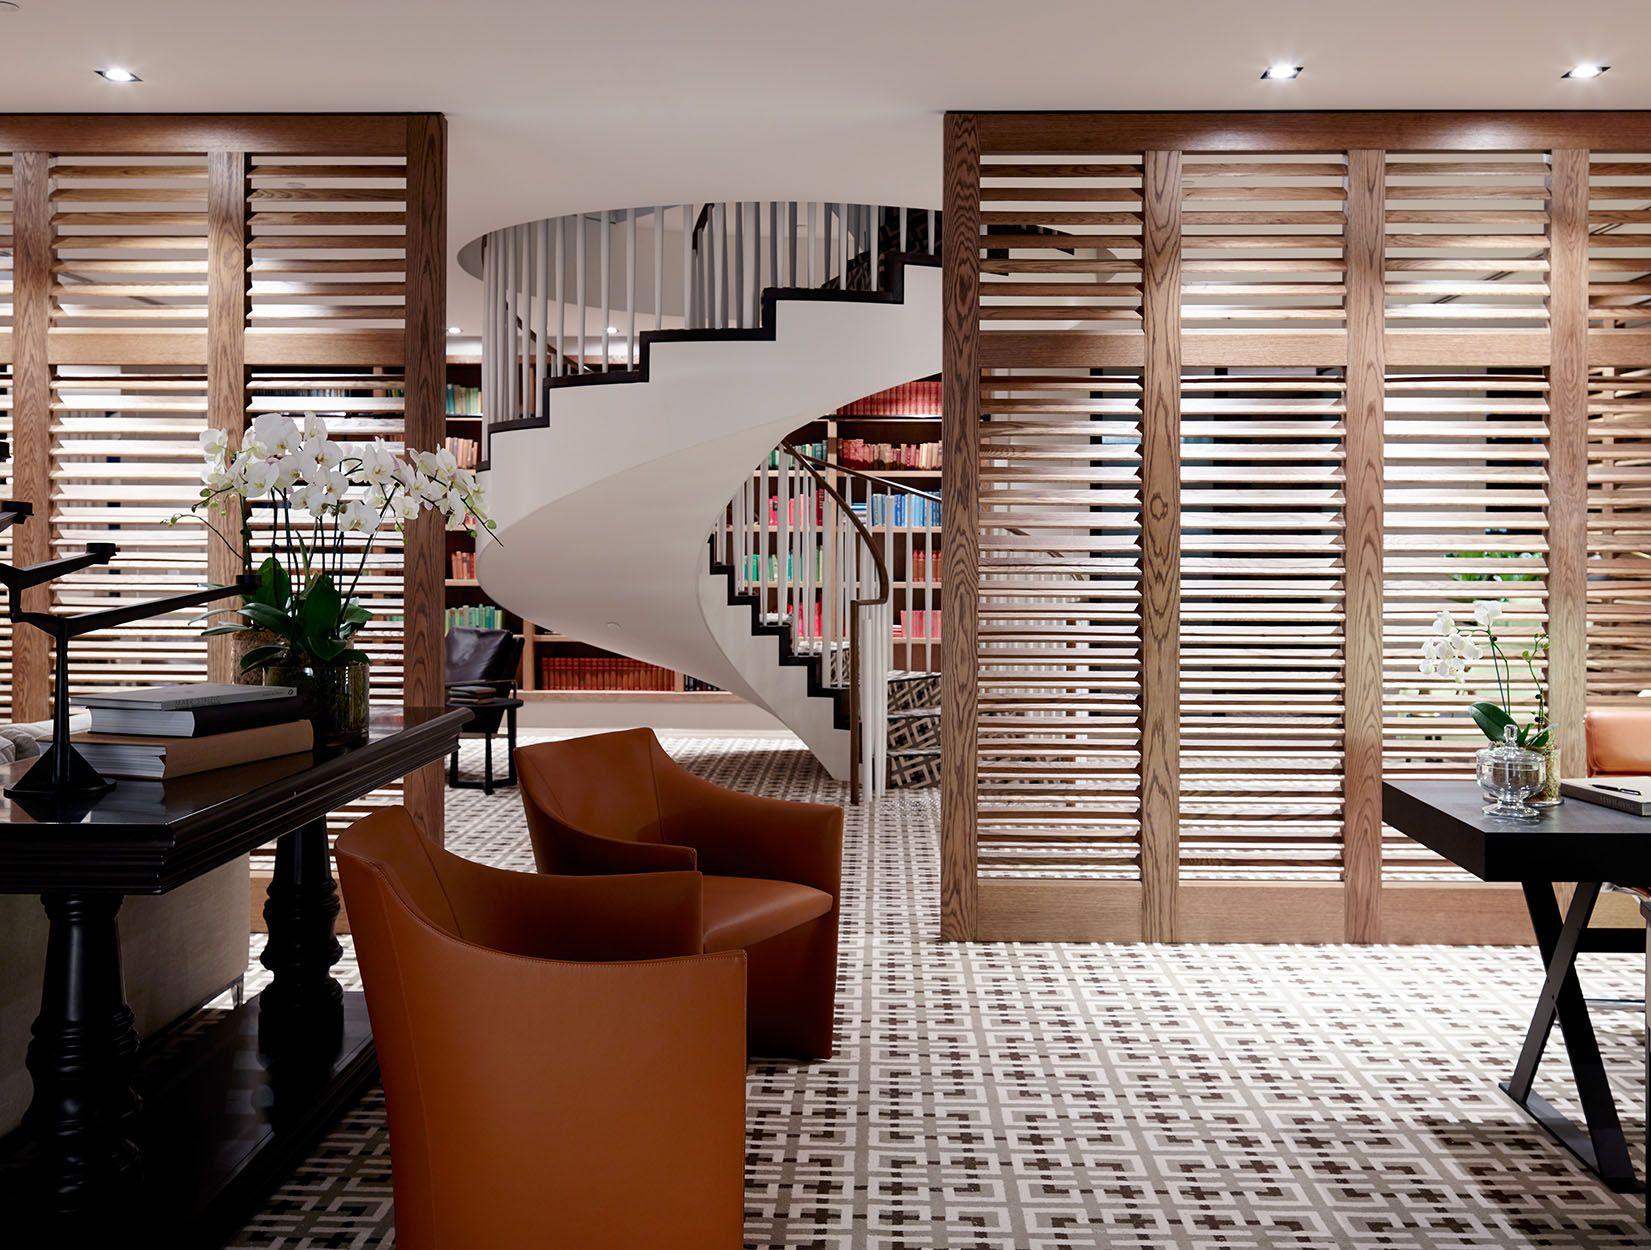 World Best Interior Designer Featuring Batessmart For More Inspiration See Also